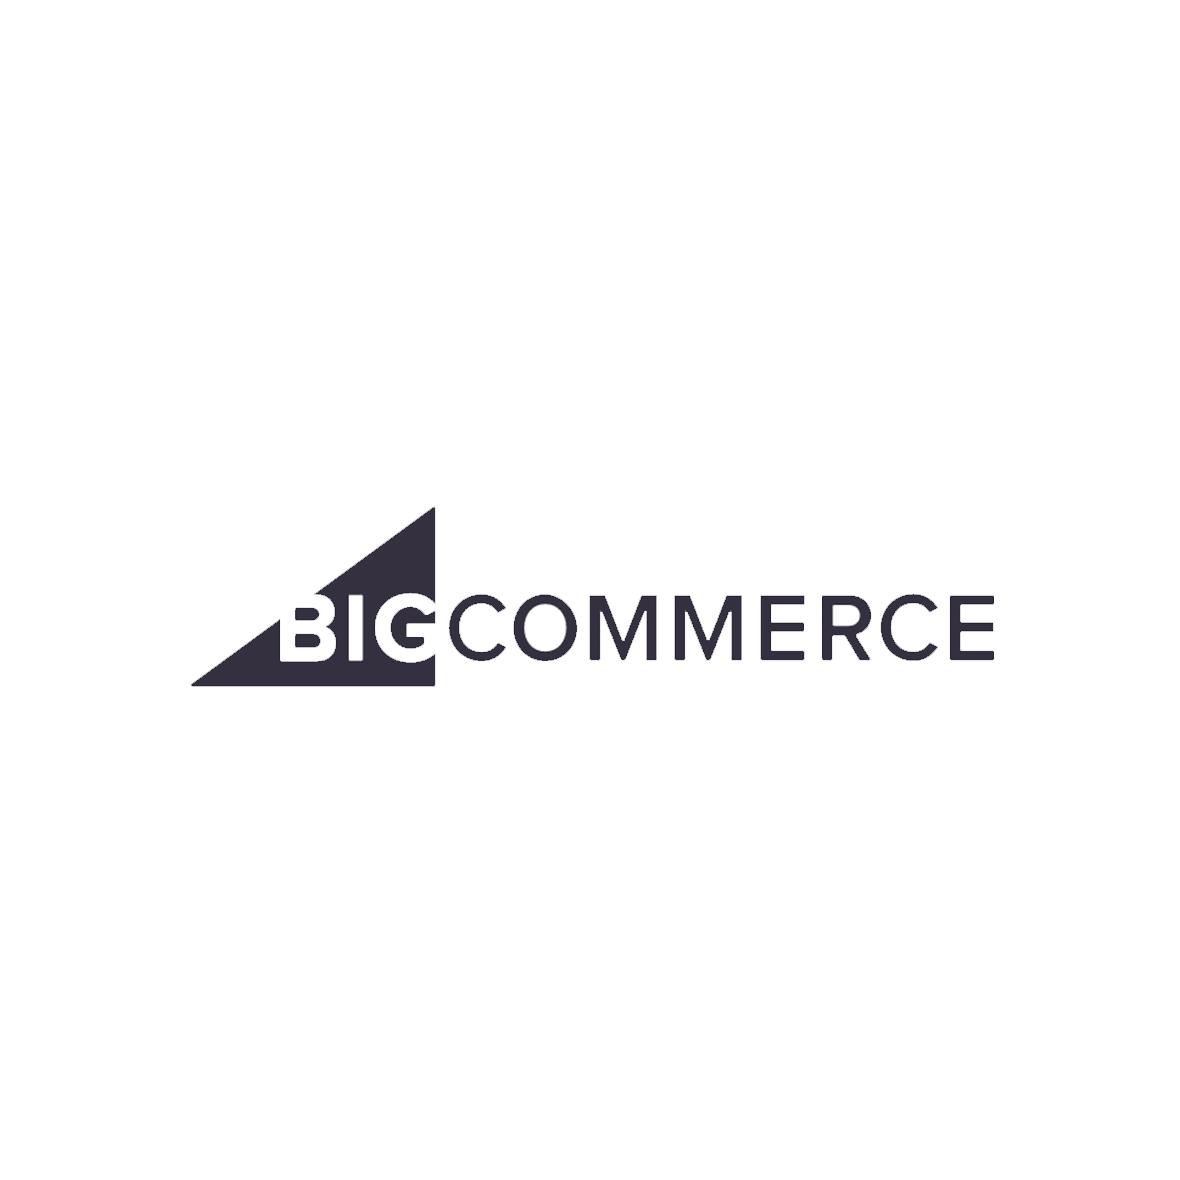 BigCommerce